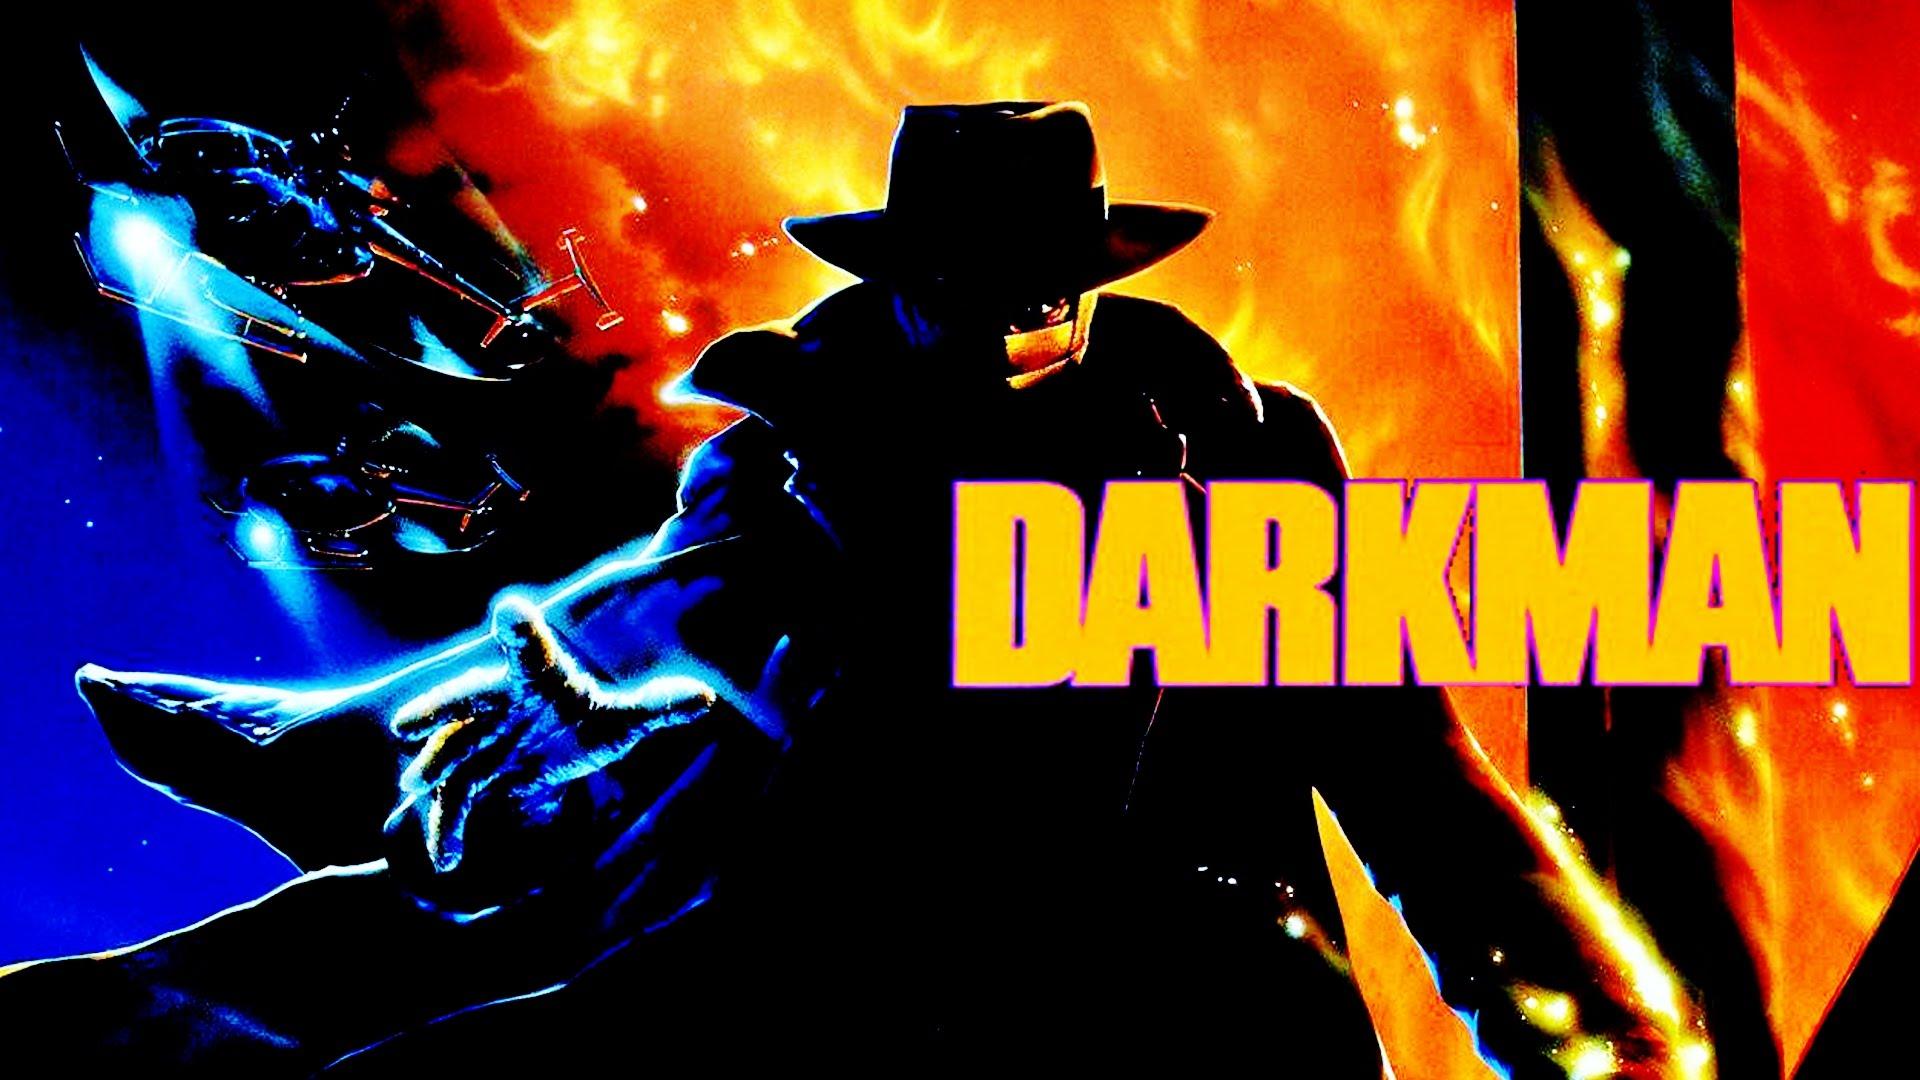 Darkman wallpapers, Movie, HQ Darkman pictures | 4K Wallpapers 2019